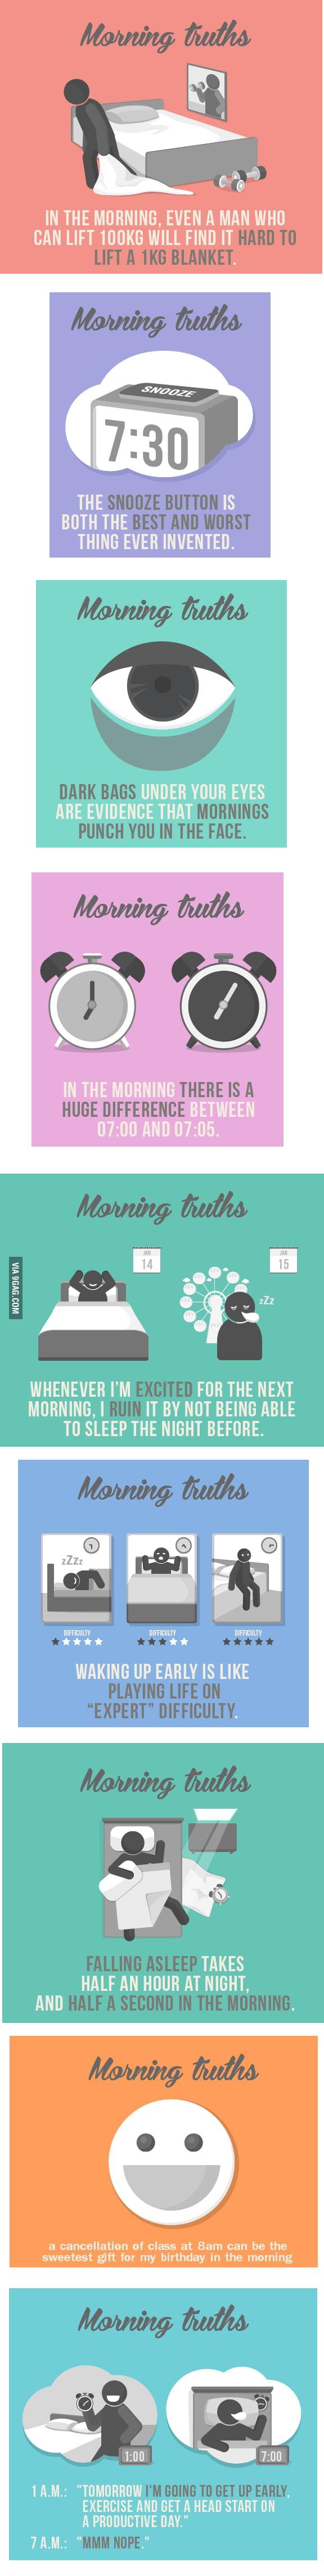 Morning truths